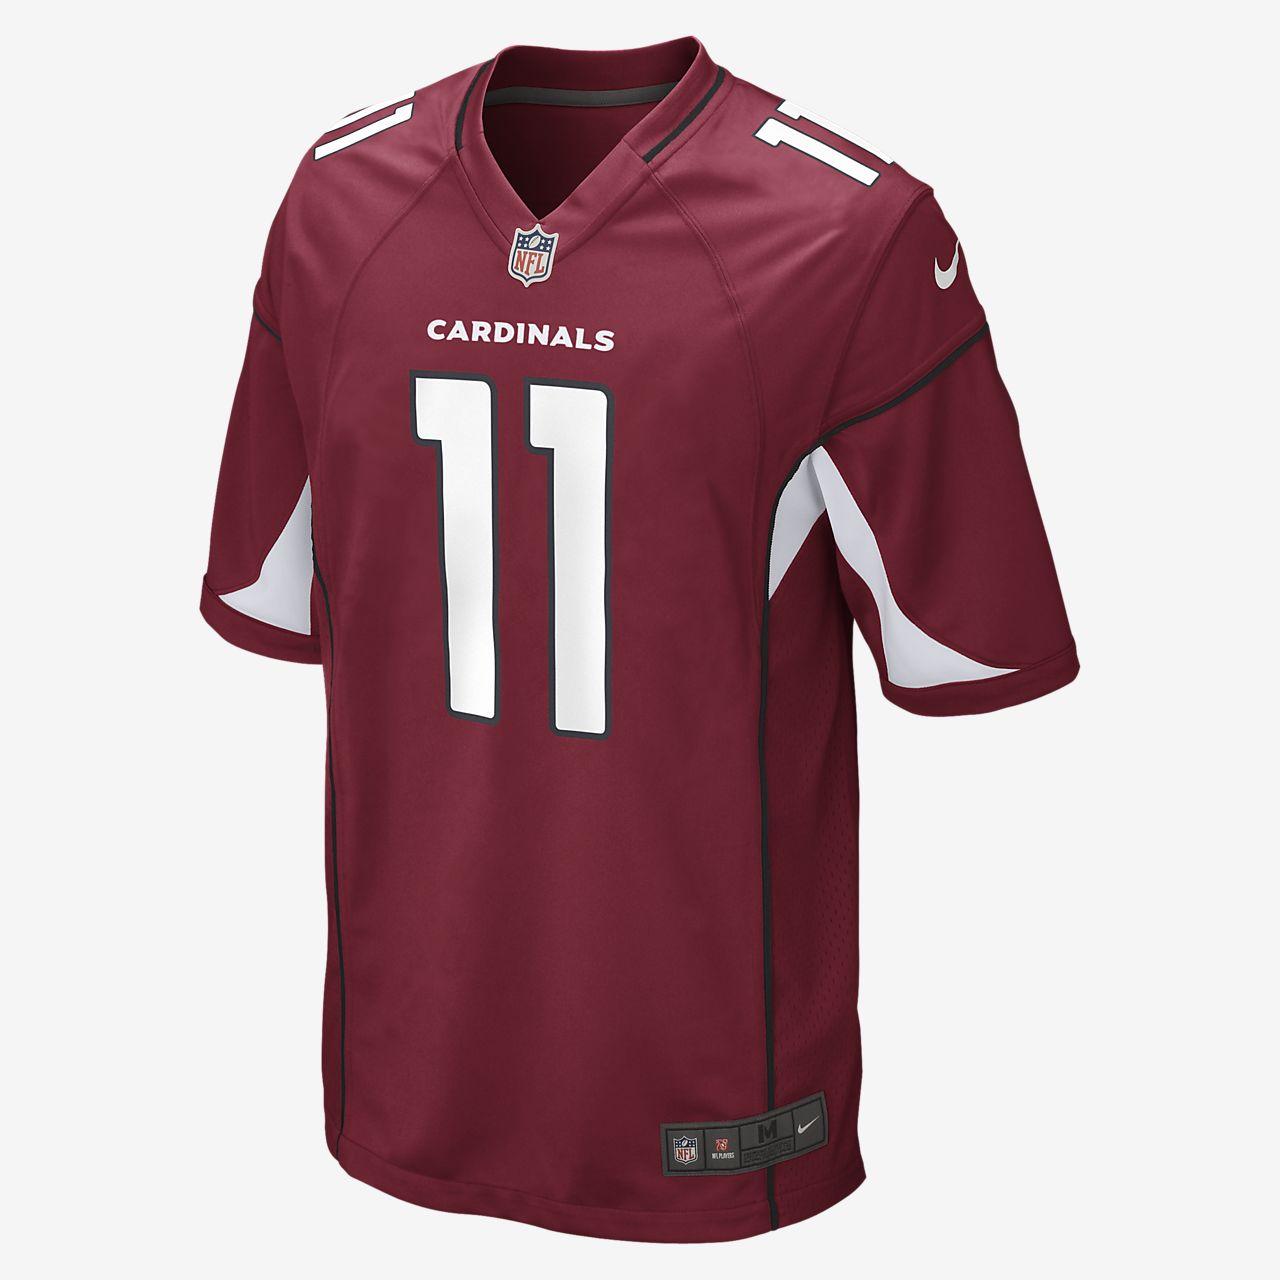 Pánský dres na americký fotbal NFL Arizona Cardinals (Larry Fitzgerald)